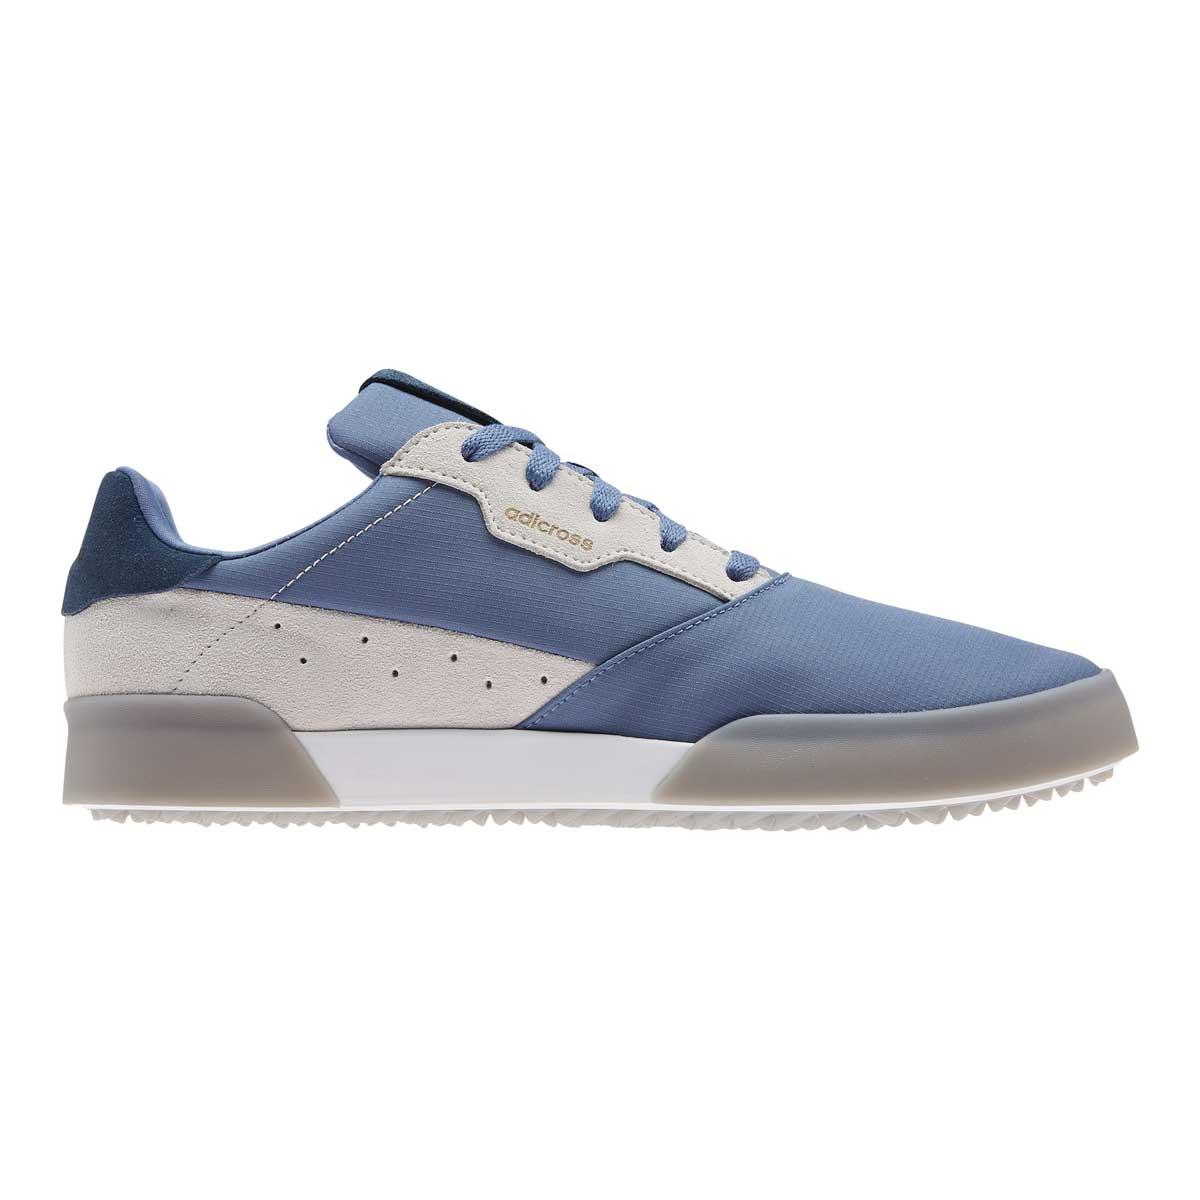 Adidas Men's Adicross Retro Crew Blue Spikeless Golf Shoe